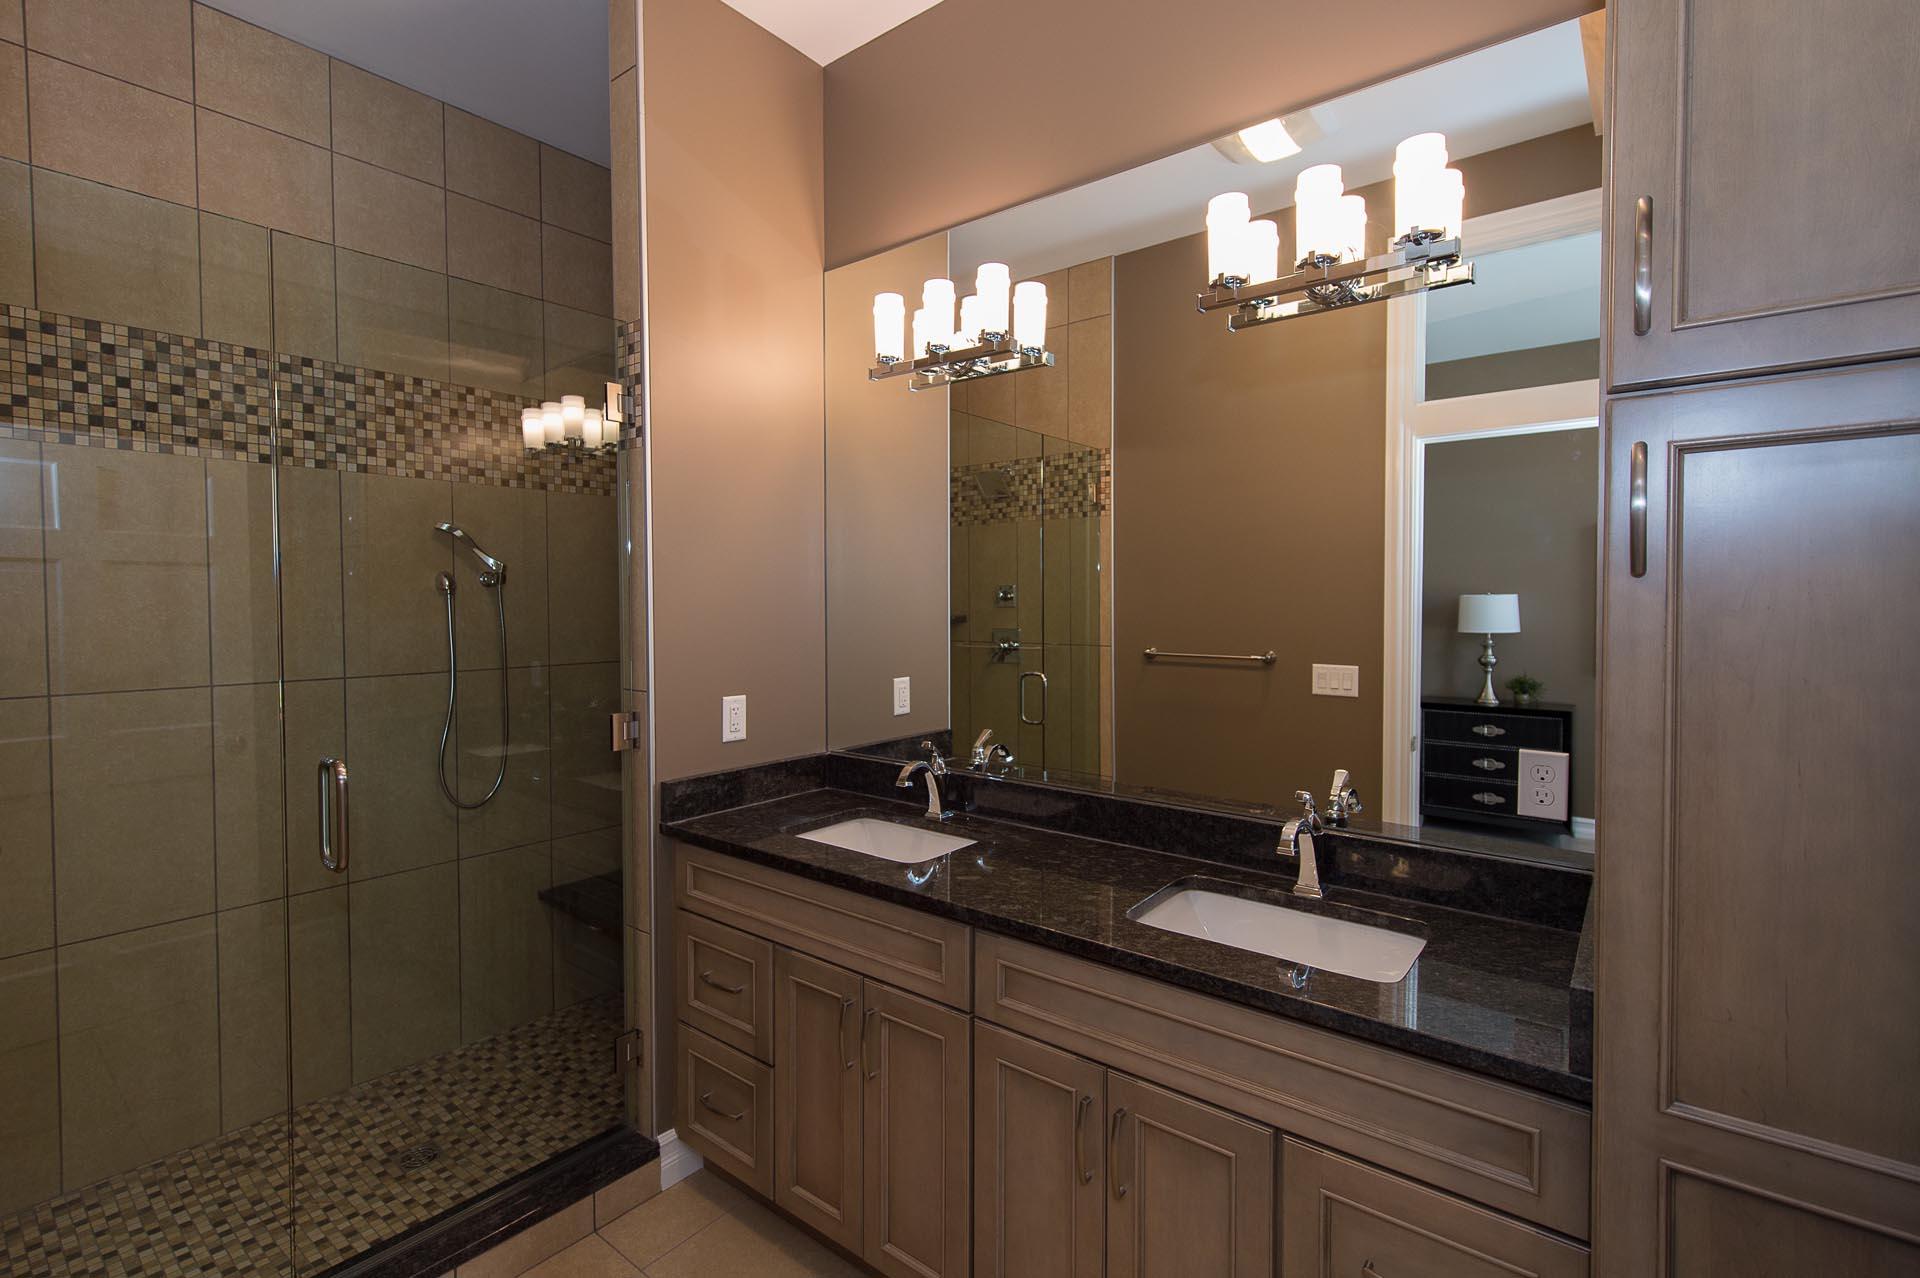 Shower and Bathroom Sink | 117 East Main St | Midland, MI